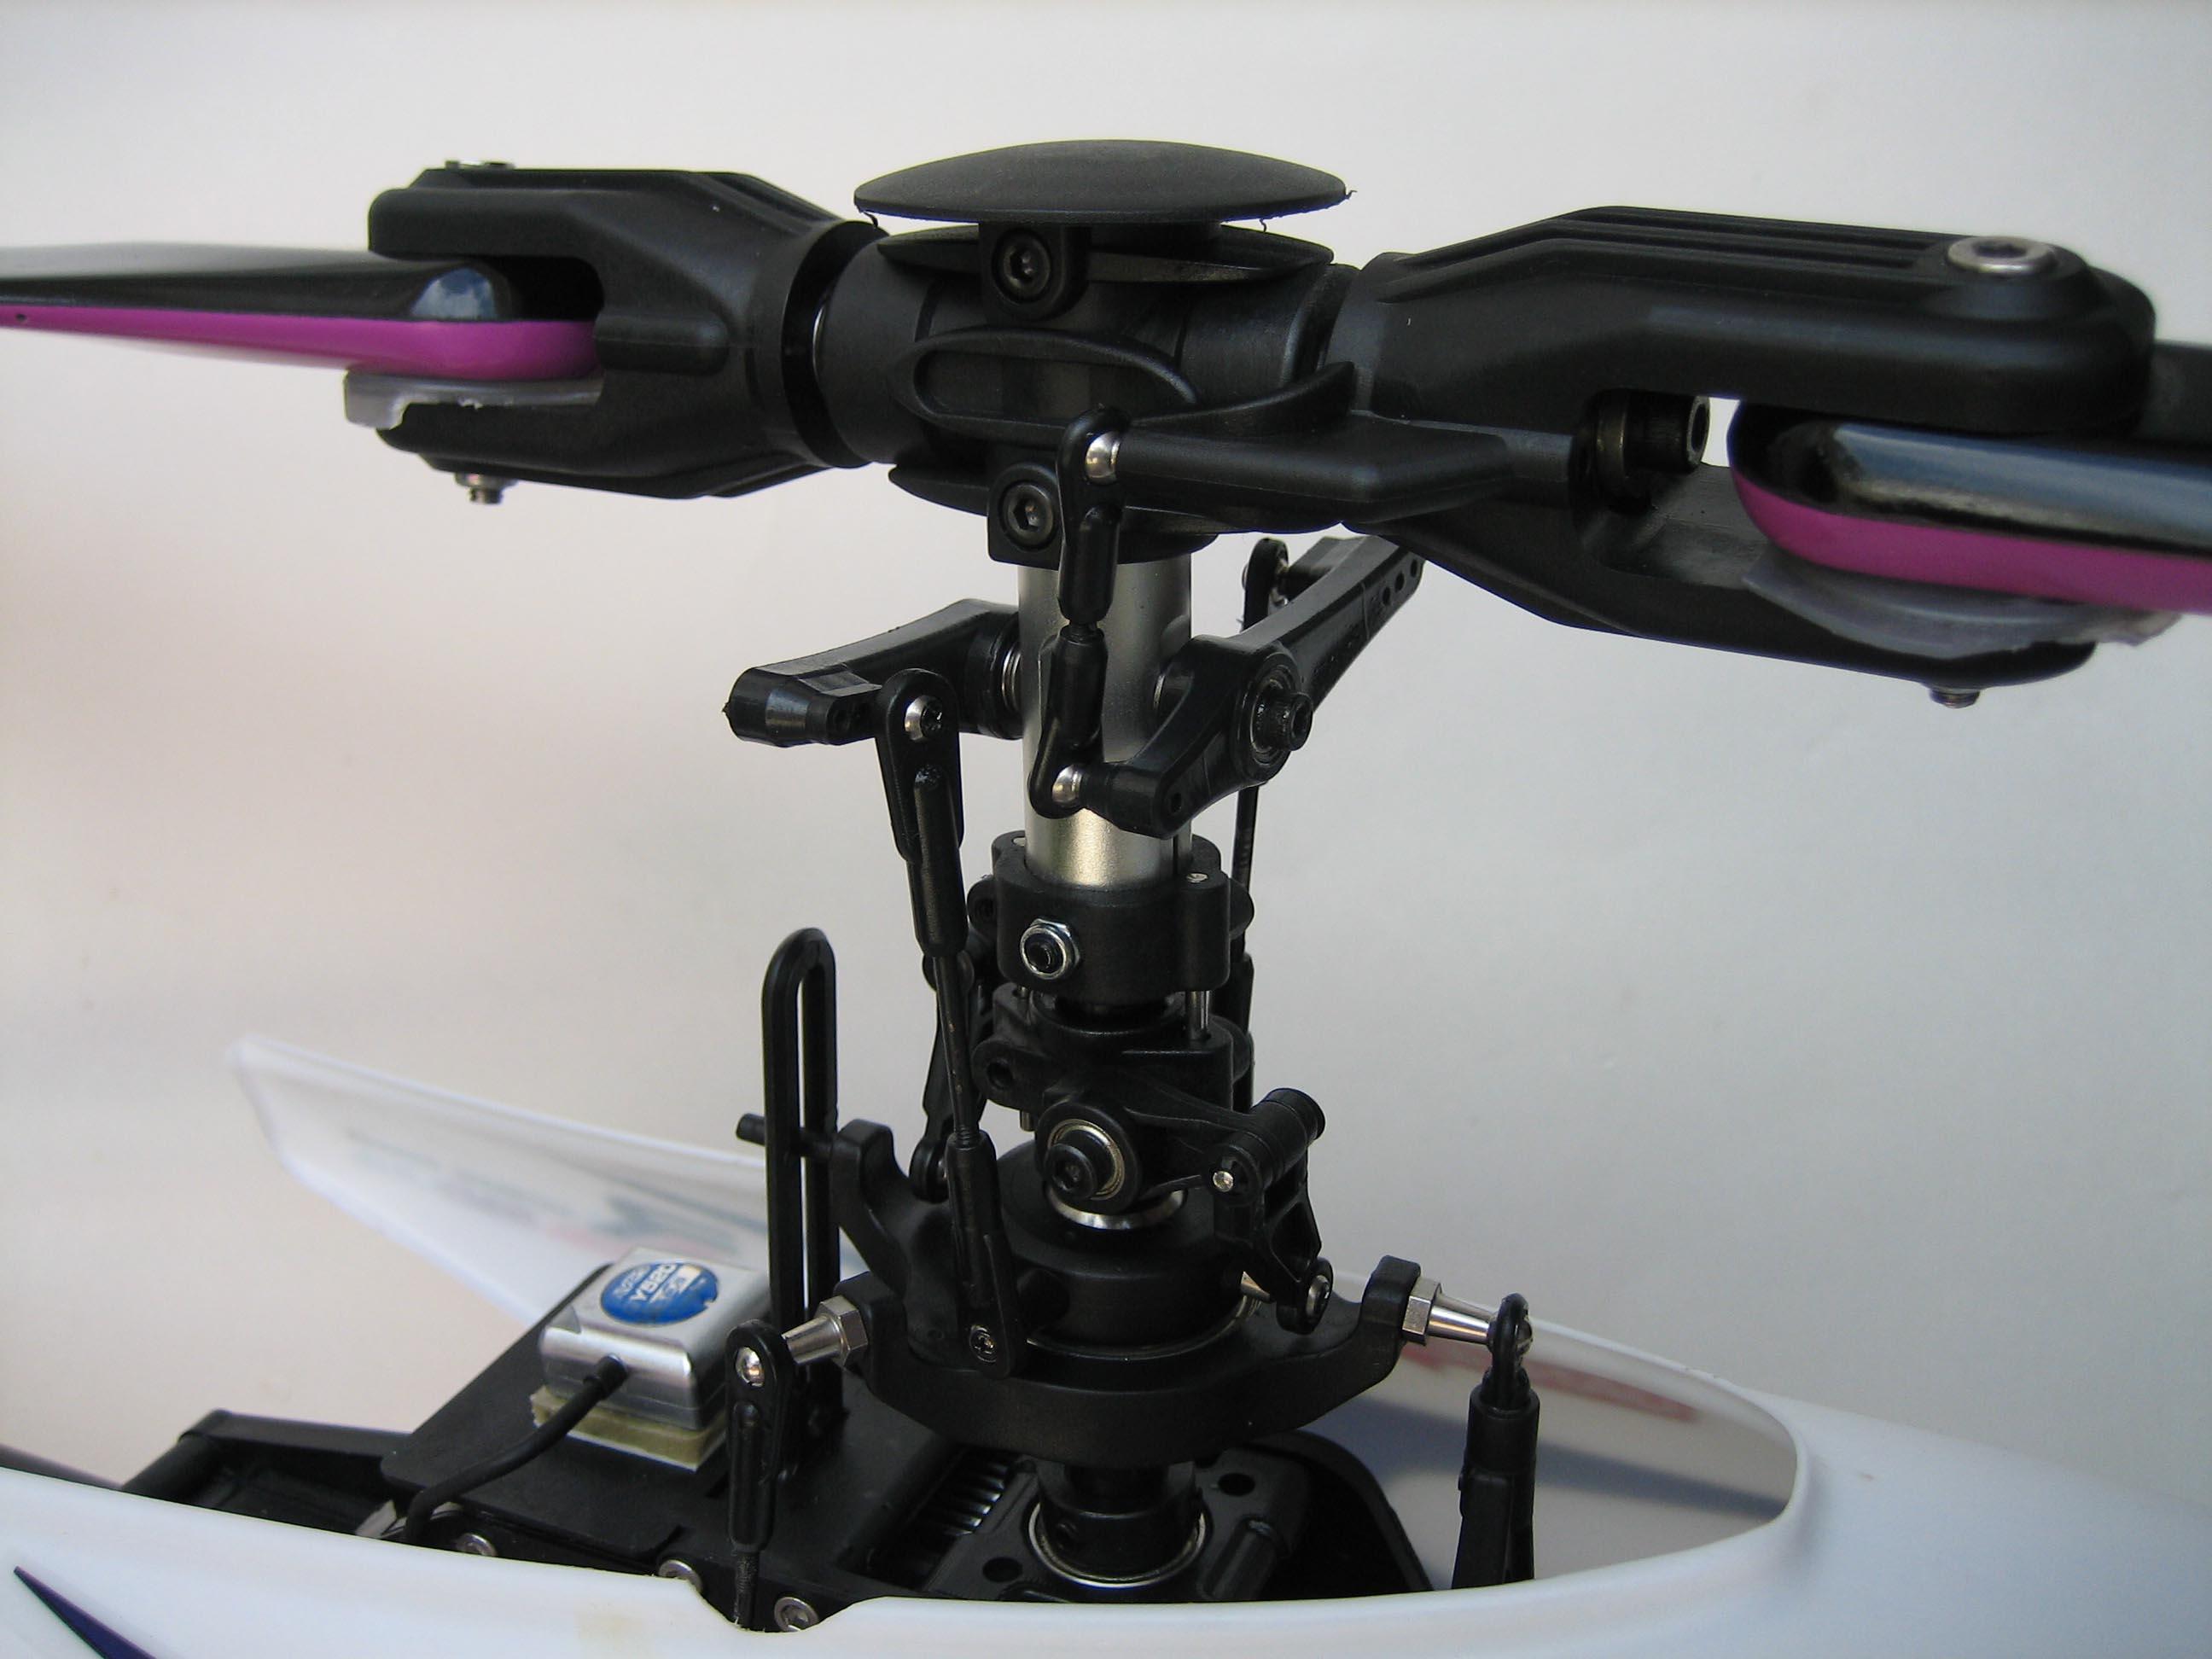 Converting the Pantera P6 to a flybarless head